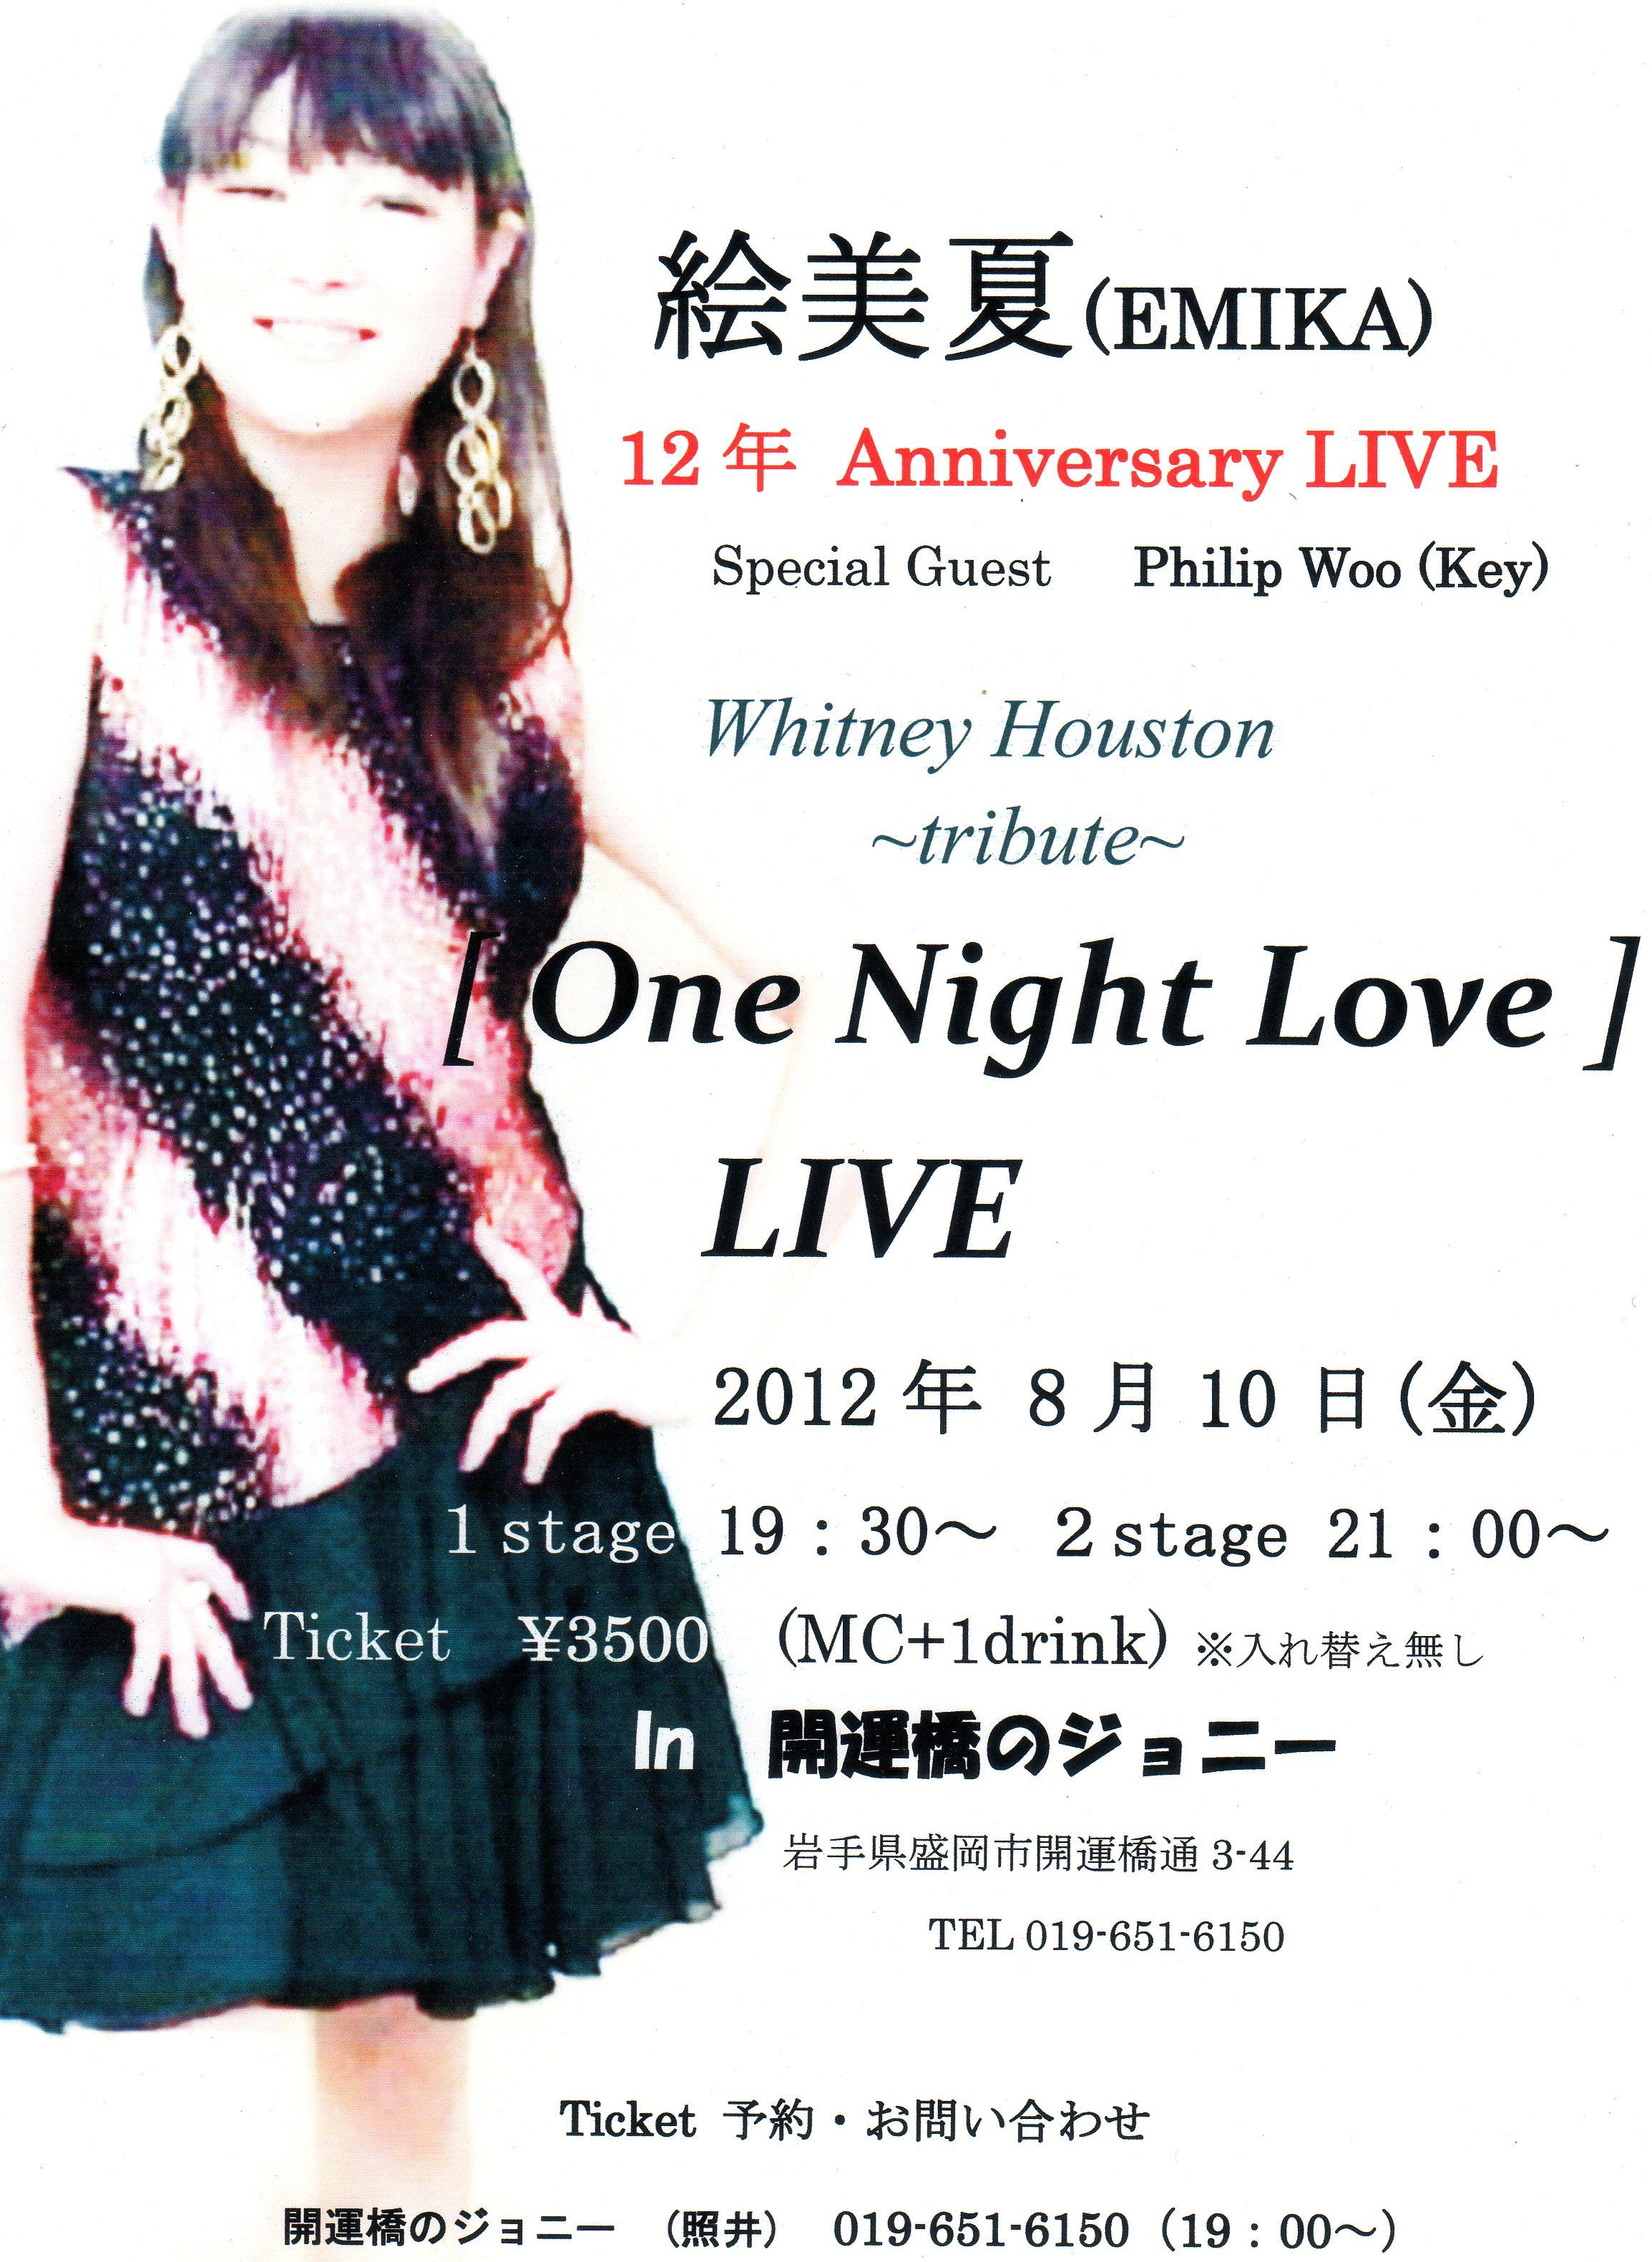 [ One Night Love ] LIVE  Whitney Houston~tribute~